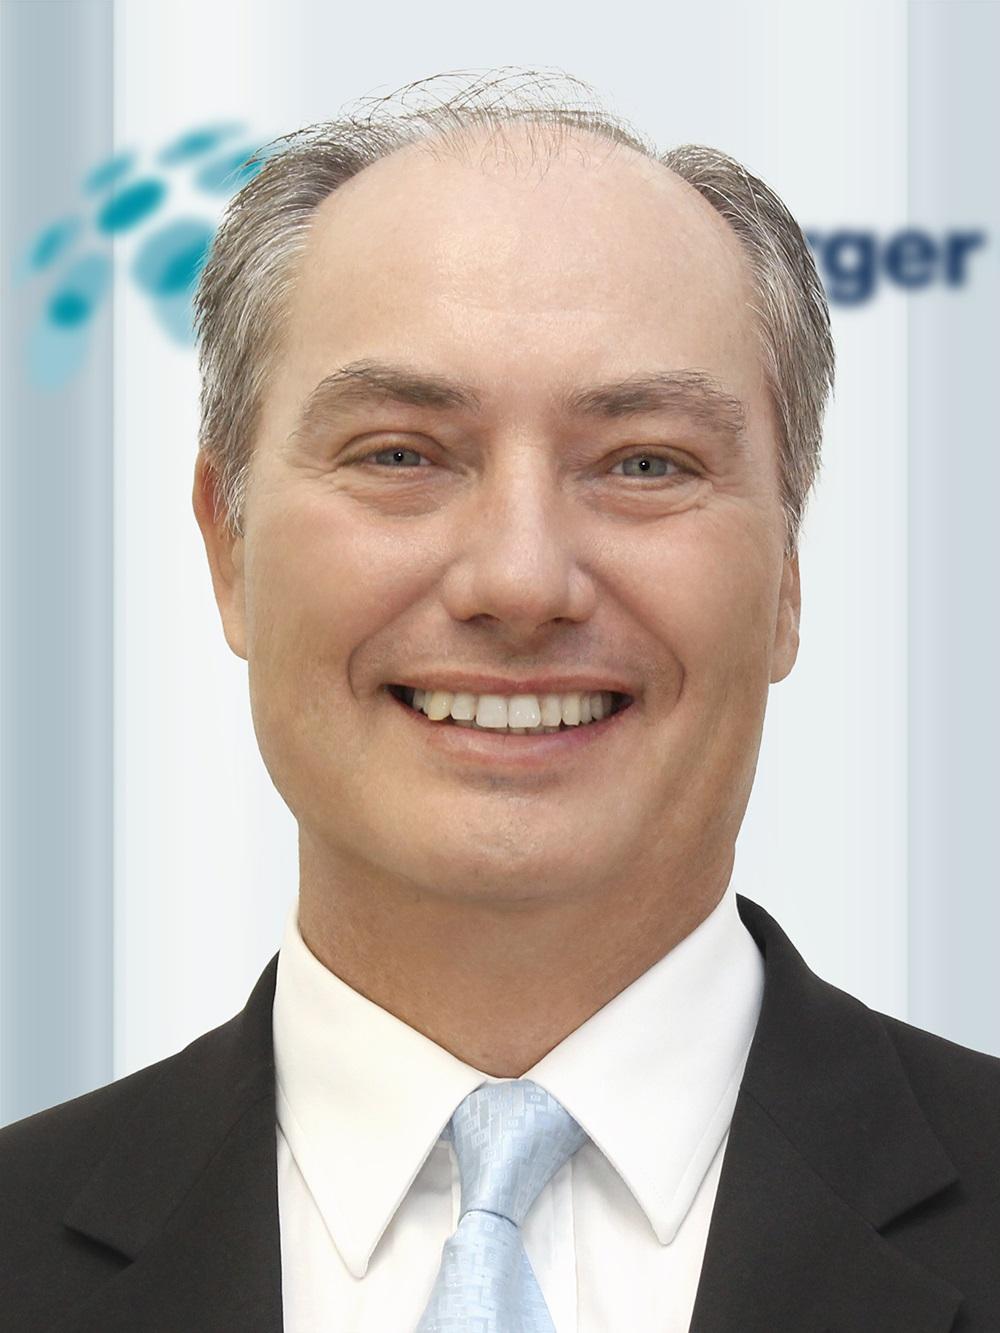 Thierry Besrest, Rosenberger OSI